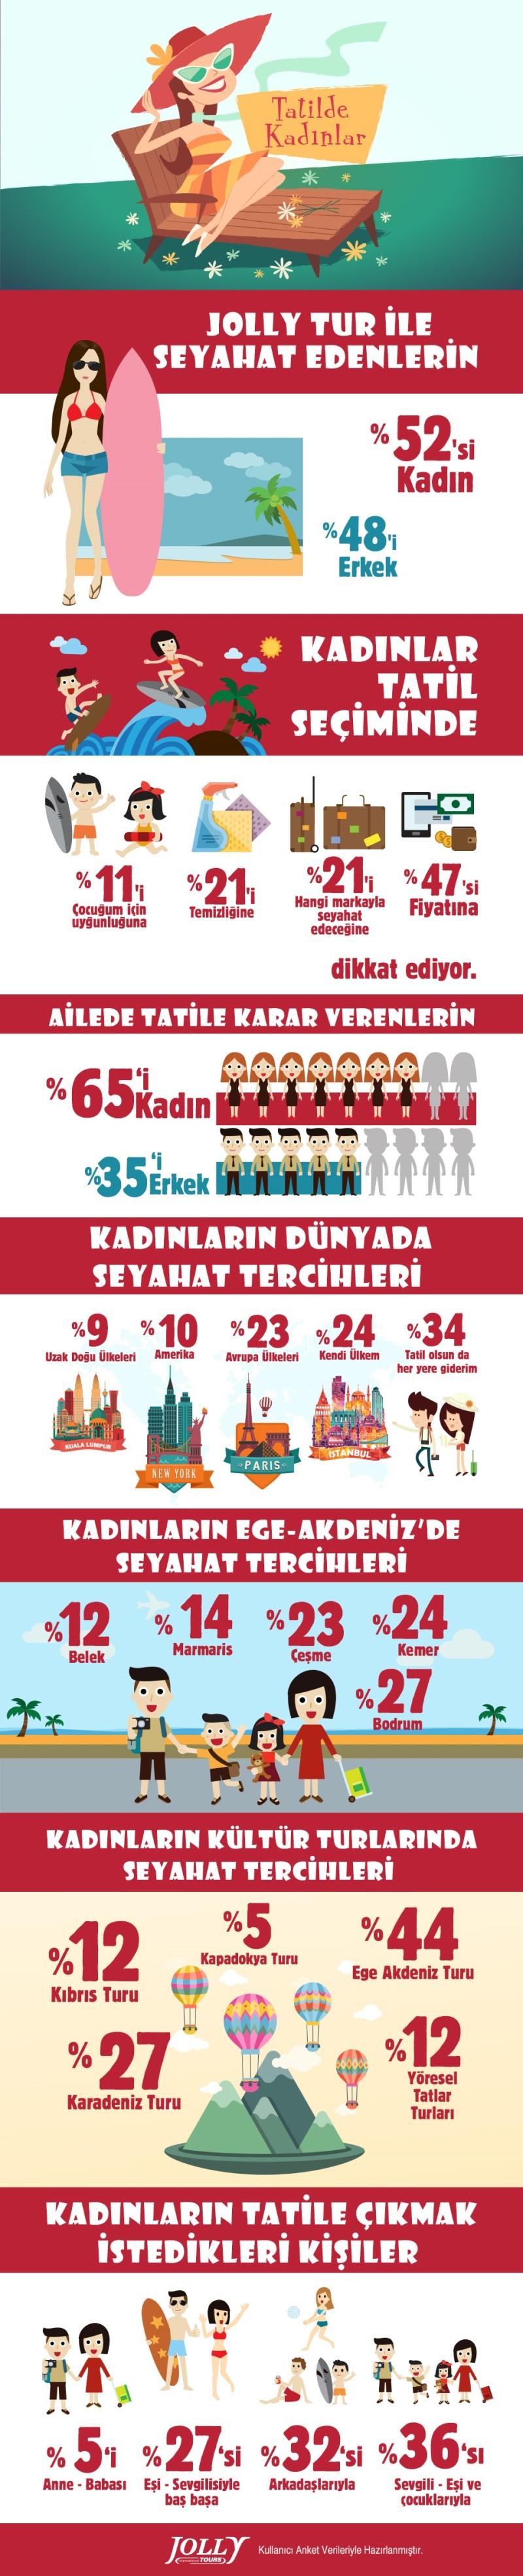 jolly_infographic_TatildeKadinlar_infografi1